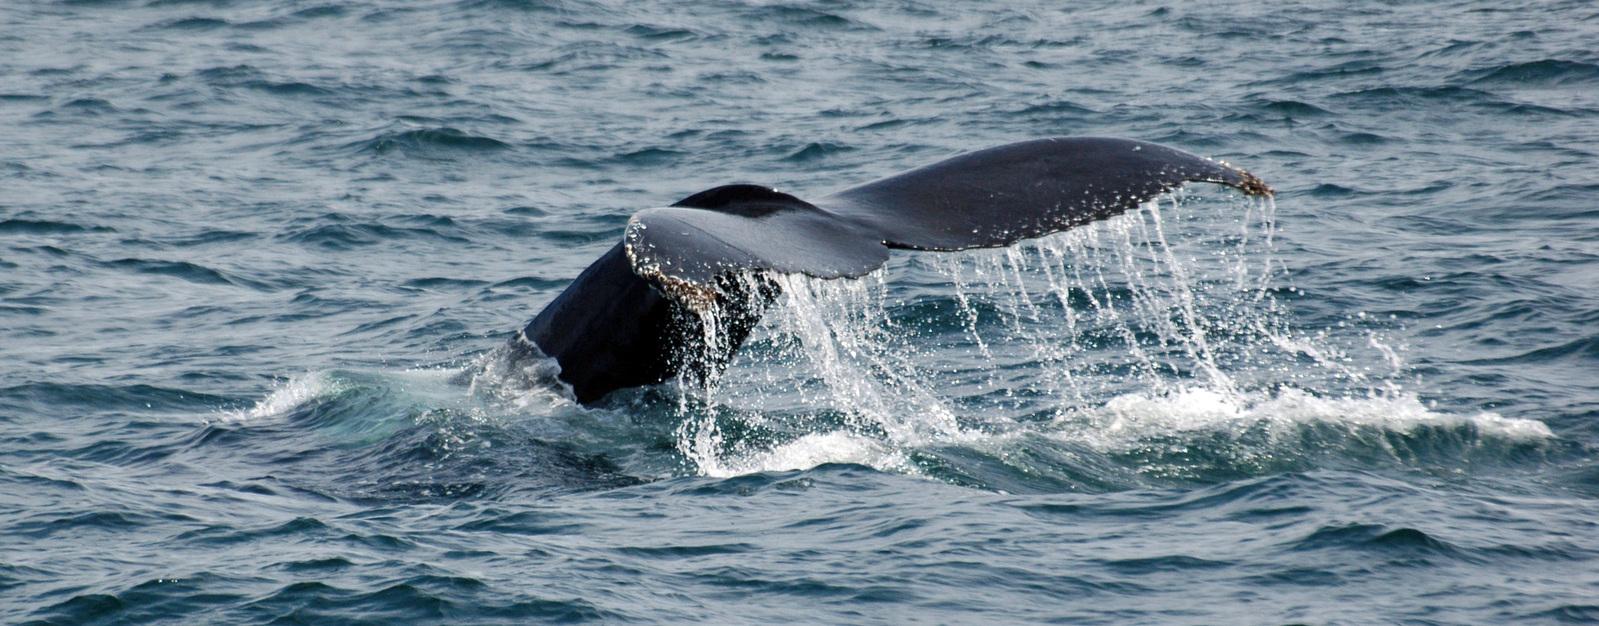 whales-2-1388817-1599x625